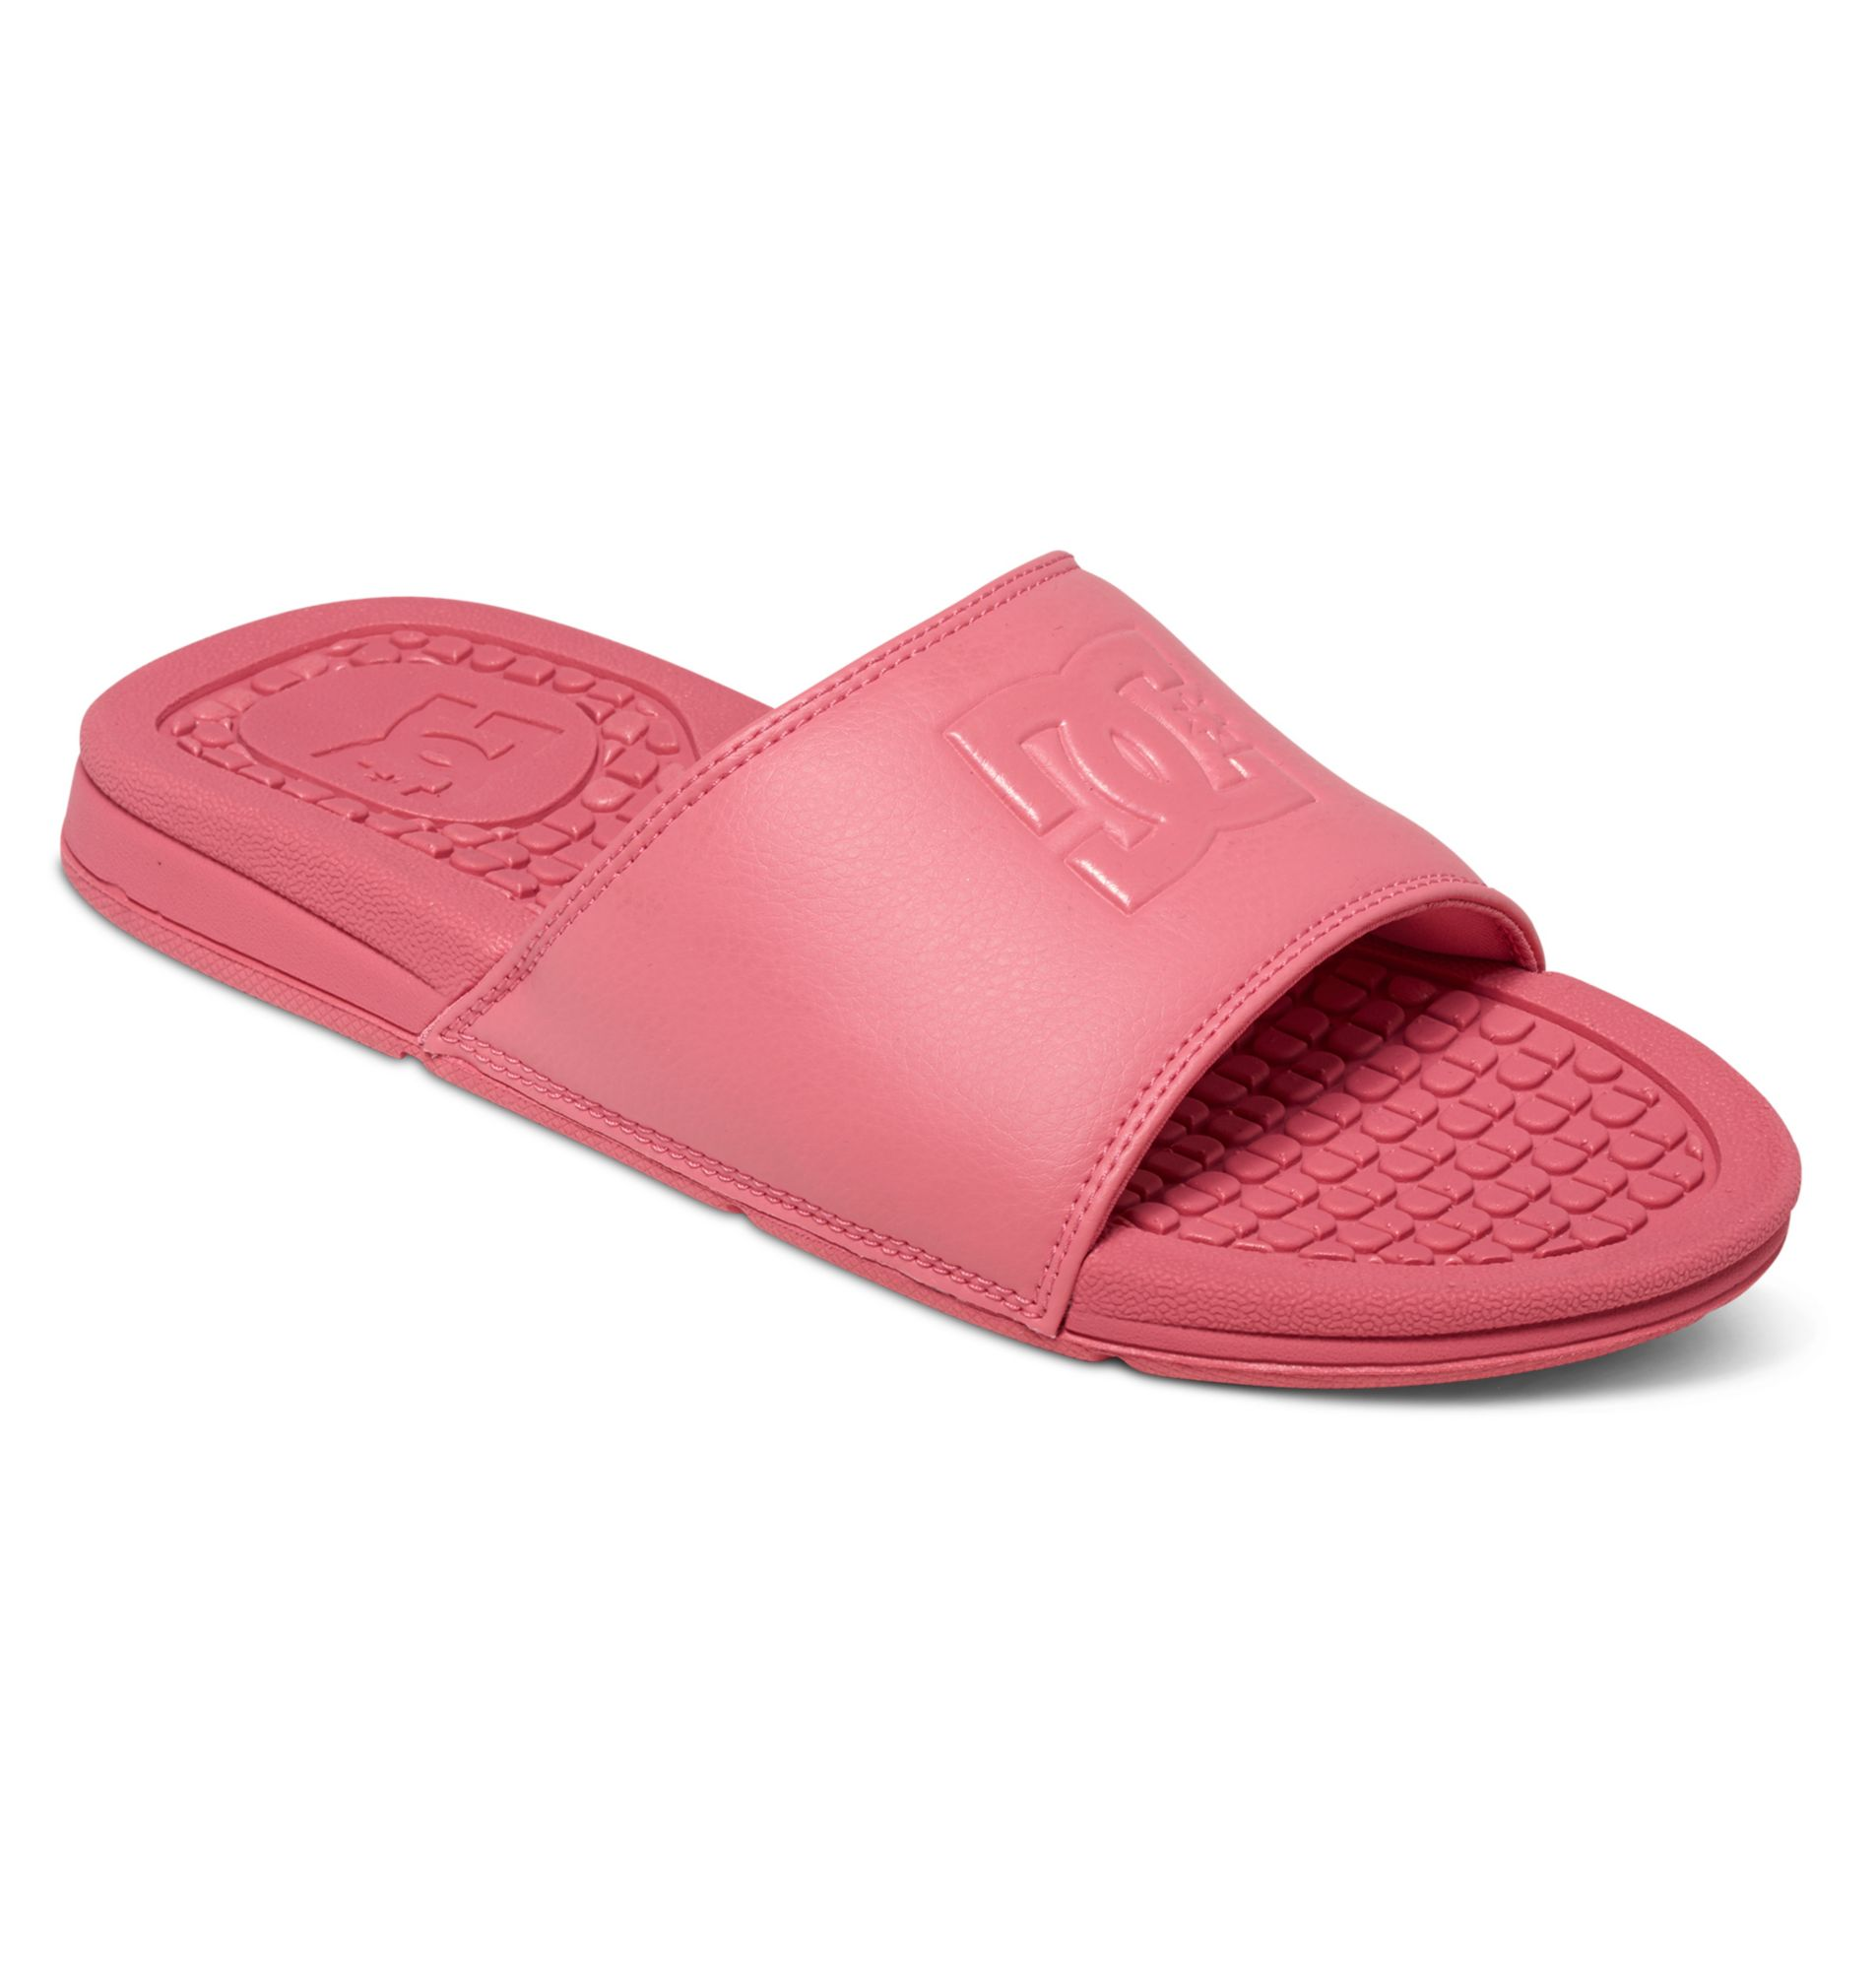 DC SHOES DC Shoes Badelatschen »Bolsa - Badelatschen«